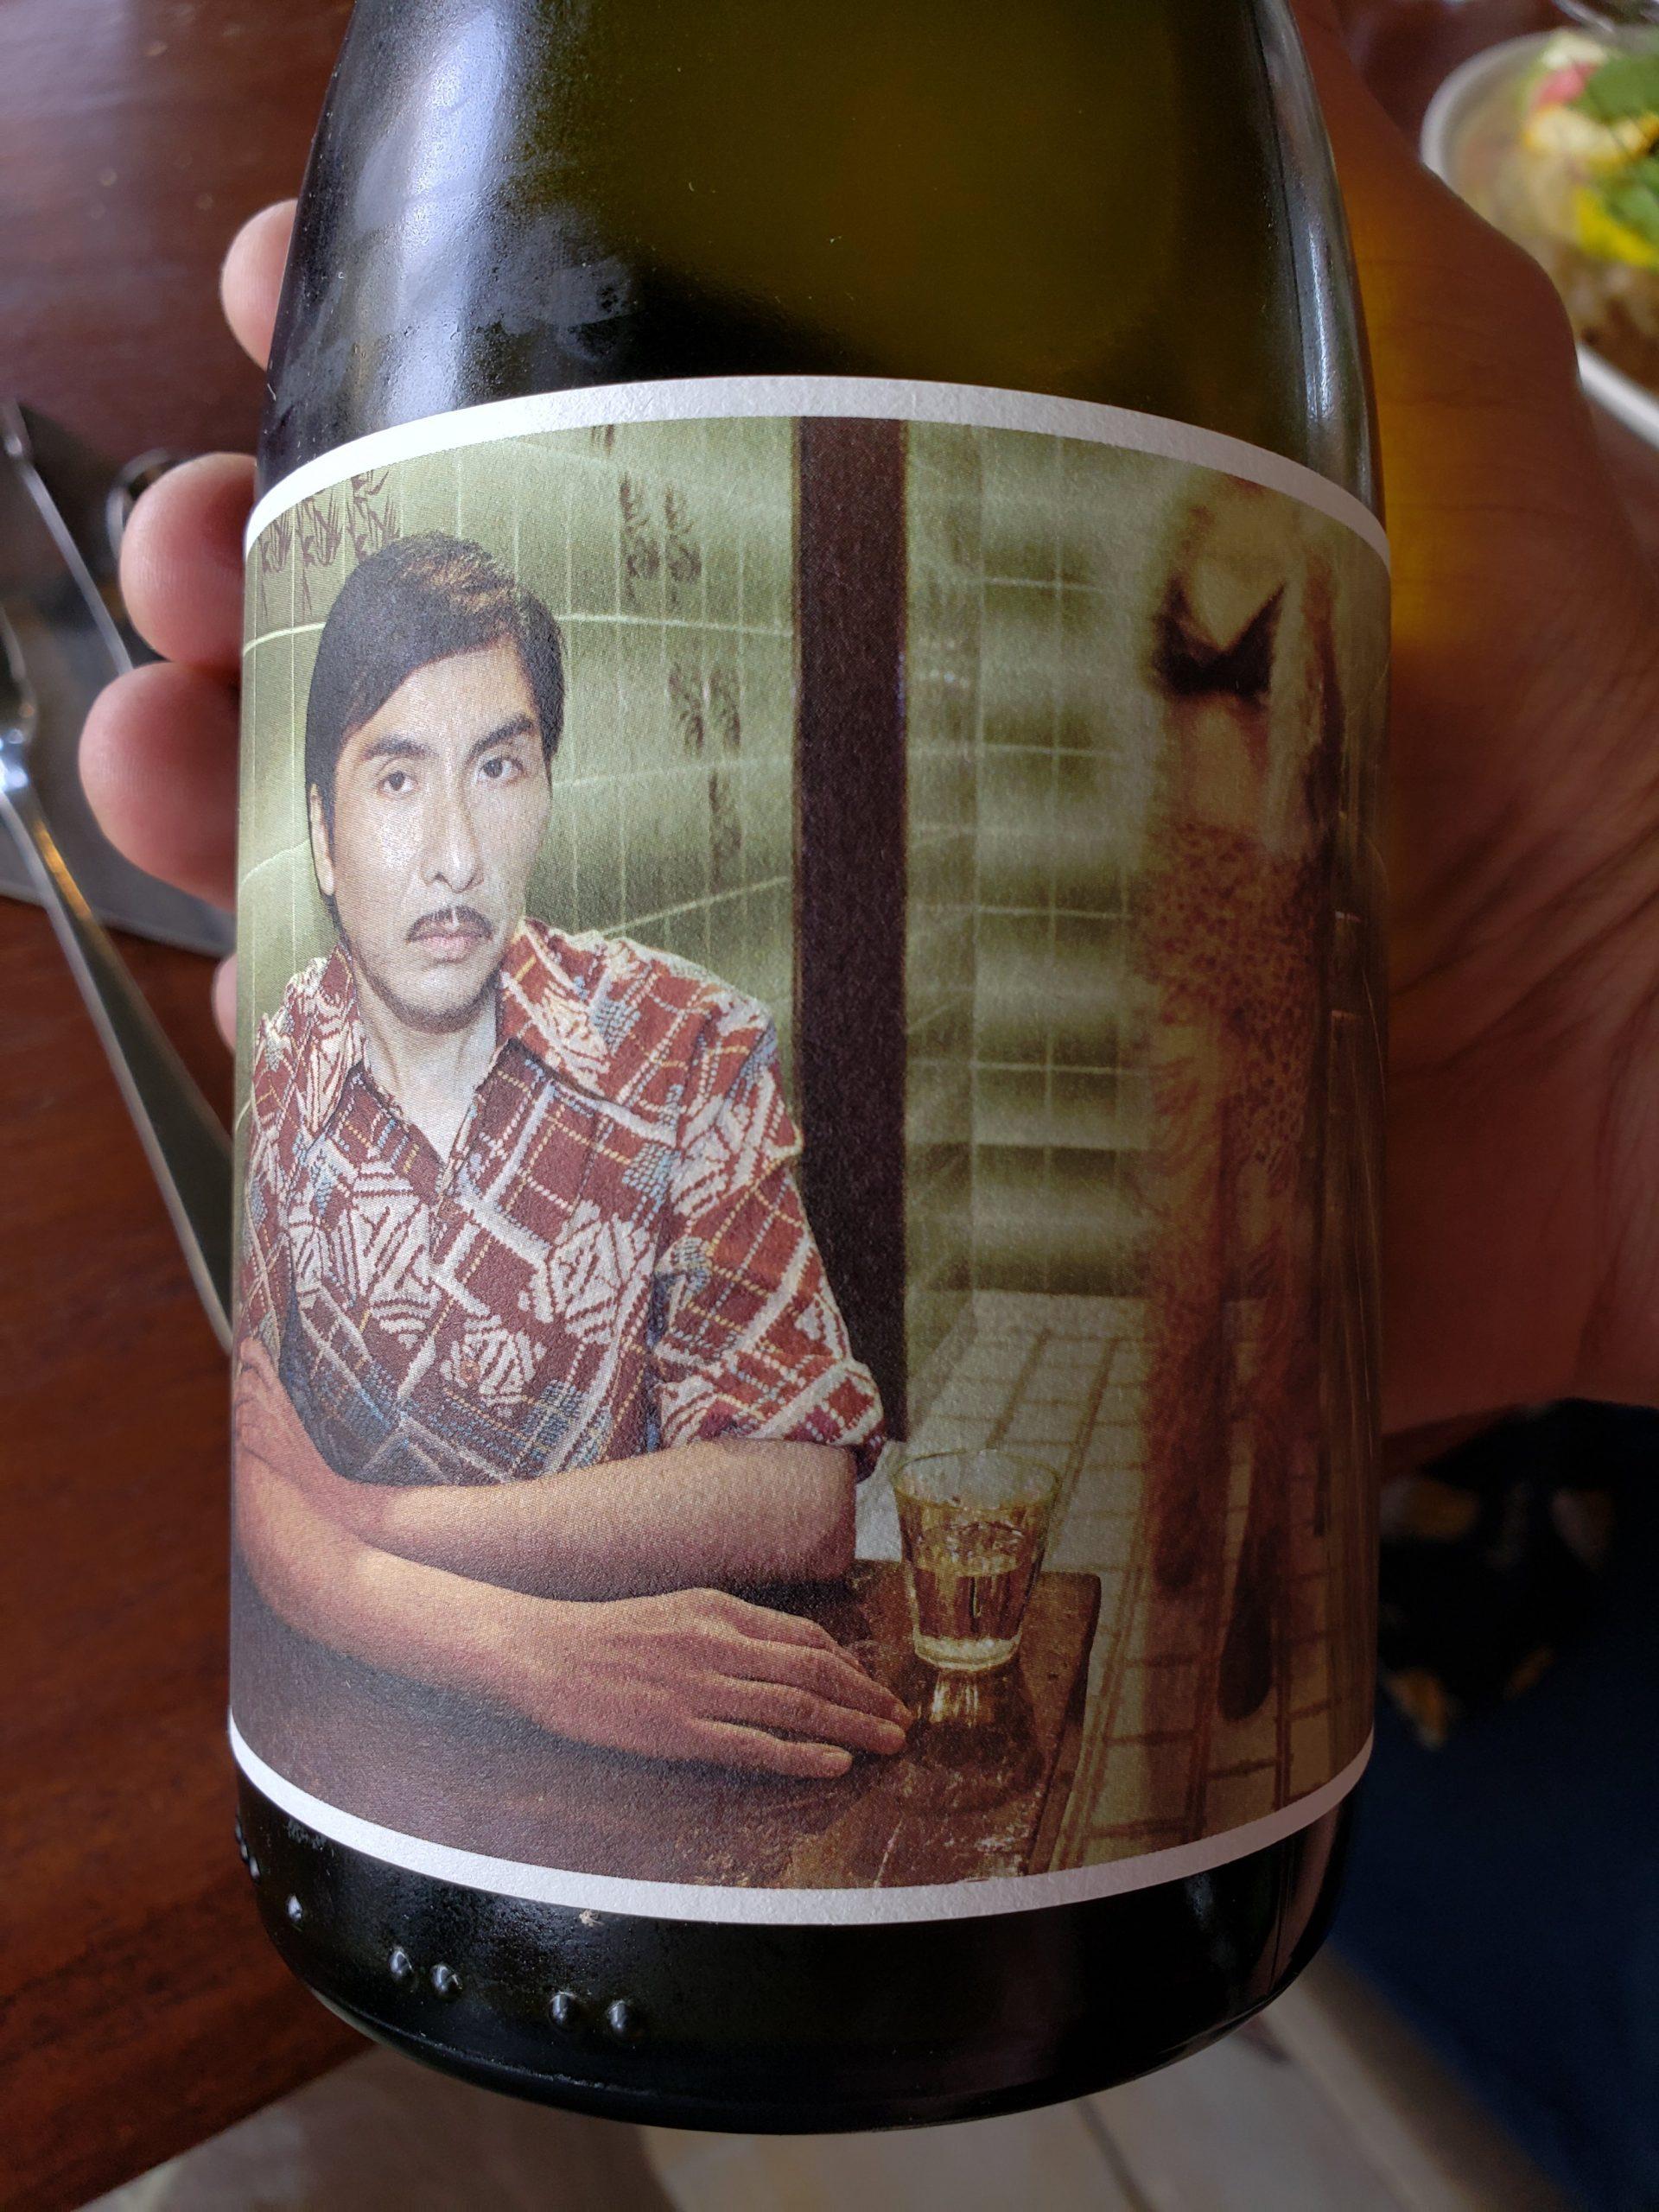 Riccitelli Bistró - Riccitelli Wines - Matías Riccitelli Blanco de la Casa